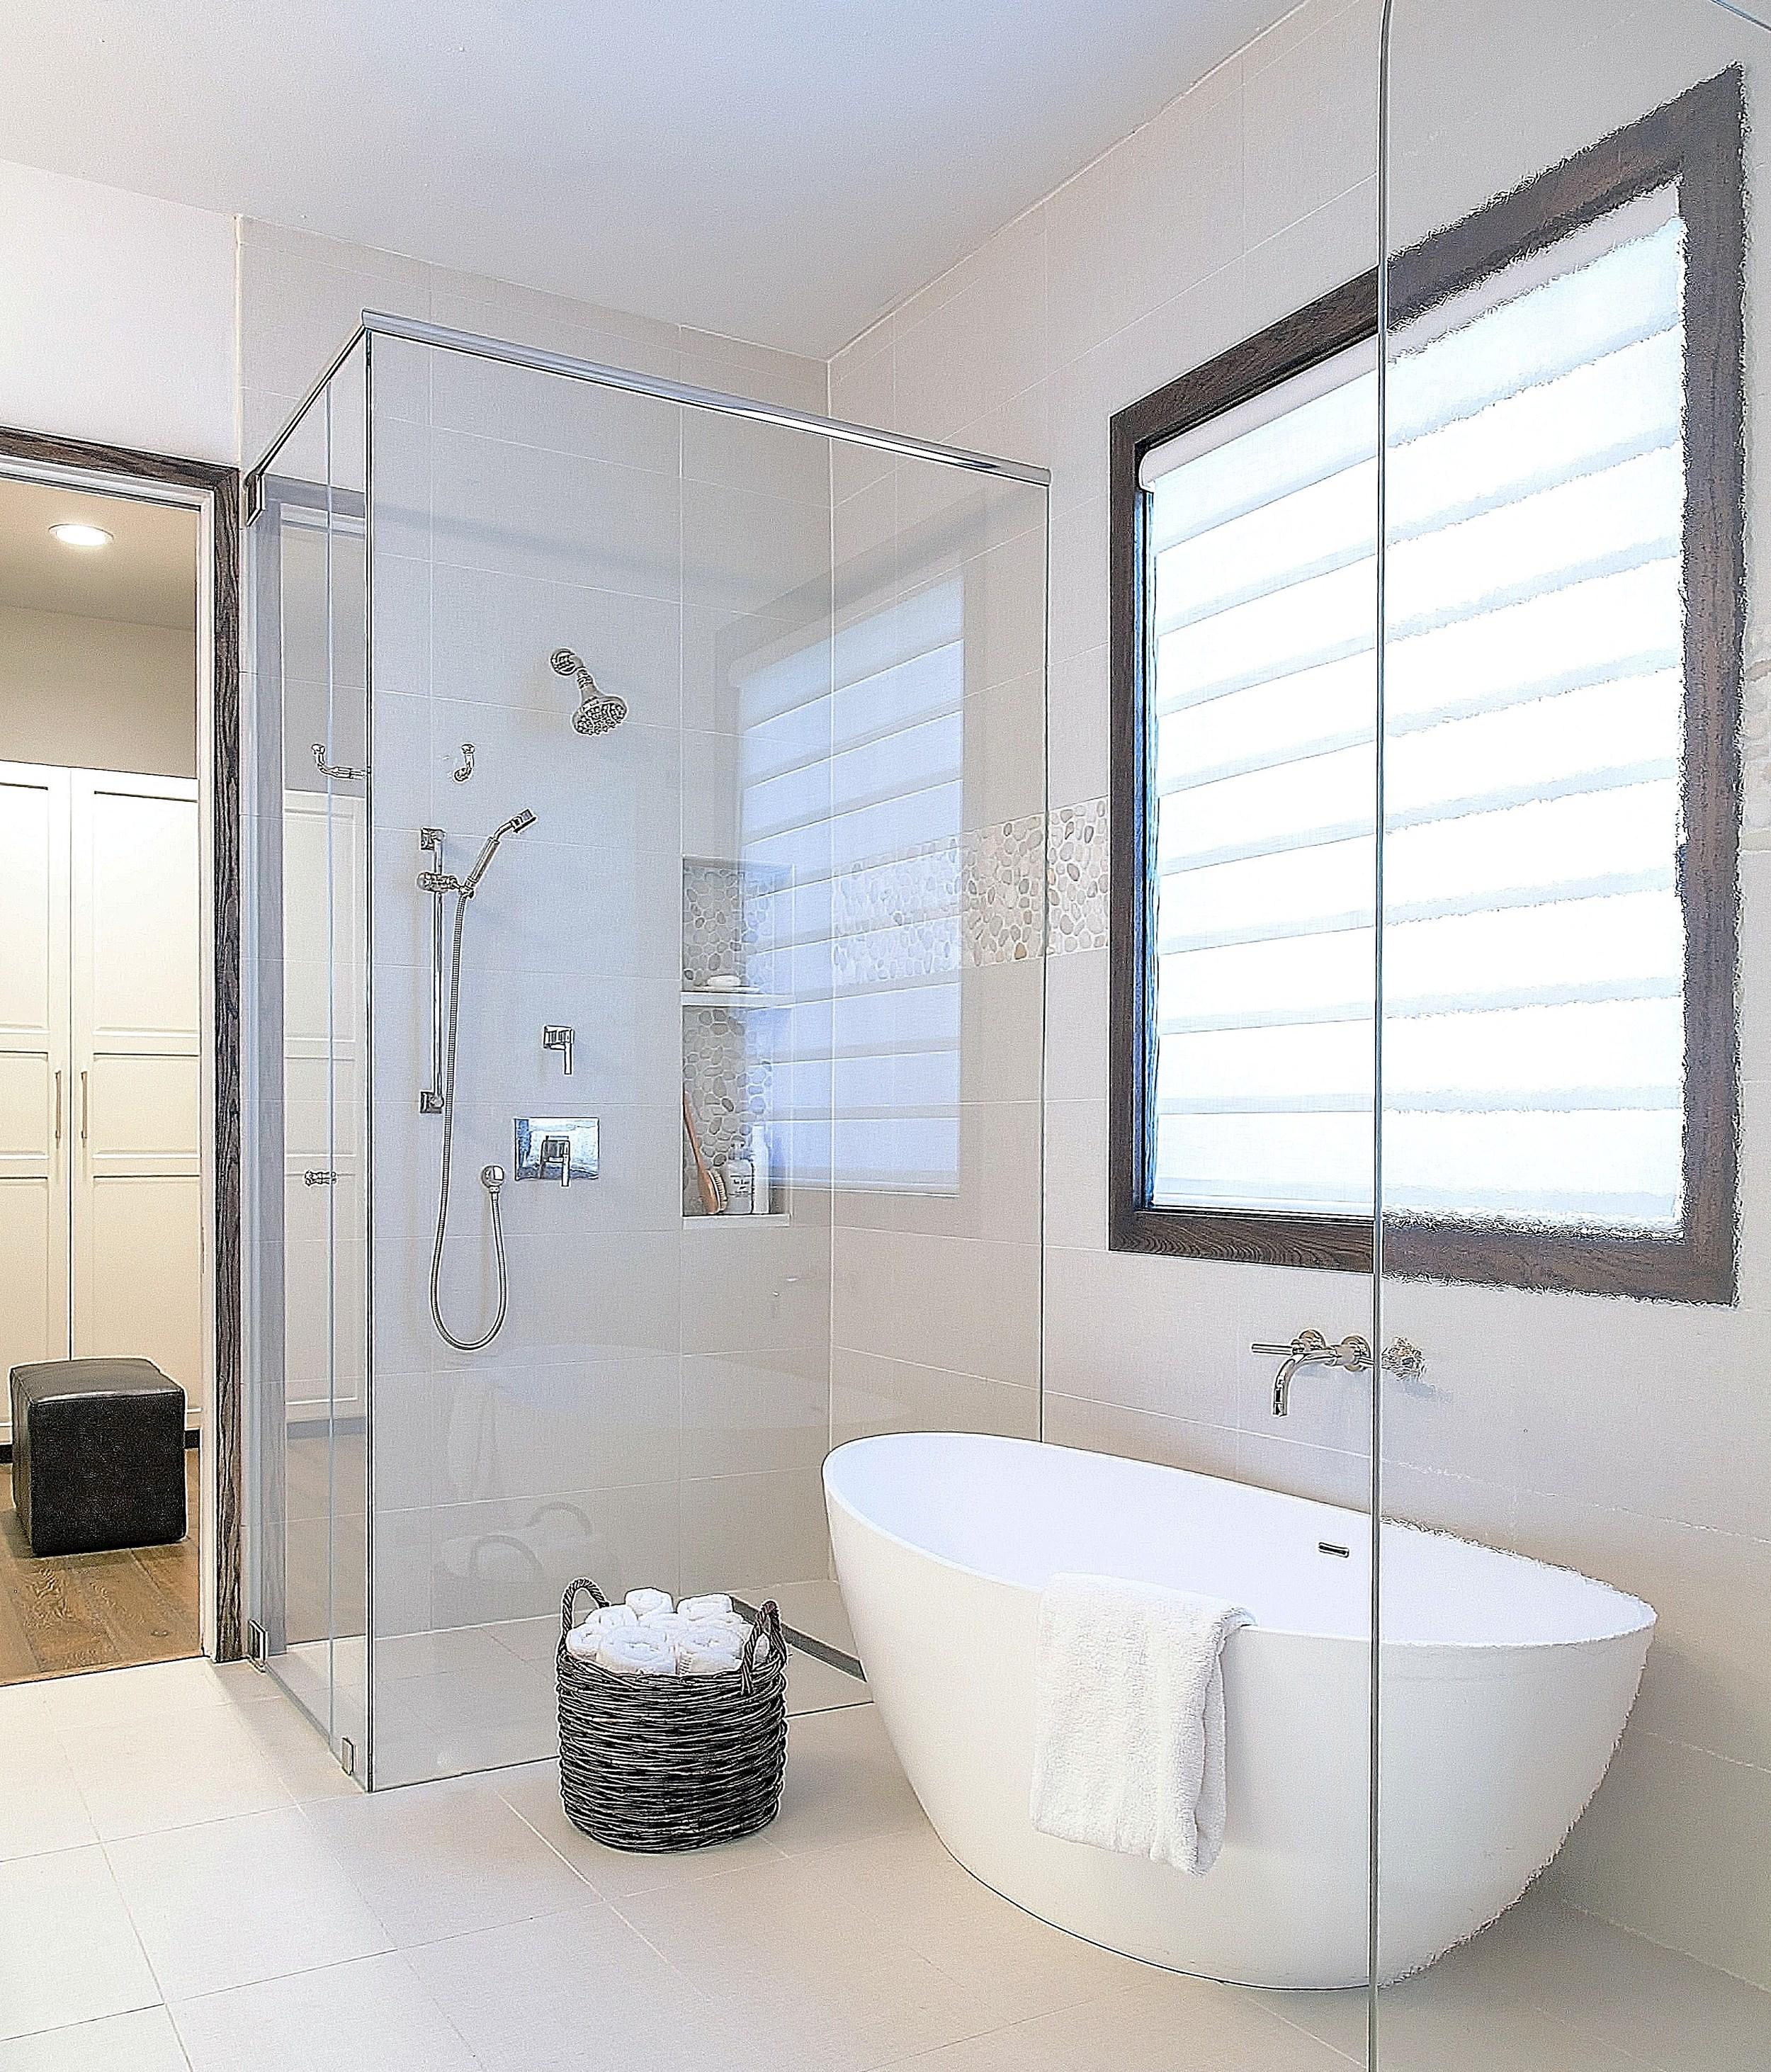 Bathroom design trends  Designer: Carla Aston, Photographer: Tori Aston #bathroom #bathroomideas #bathroomremodel